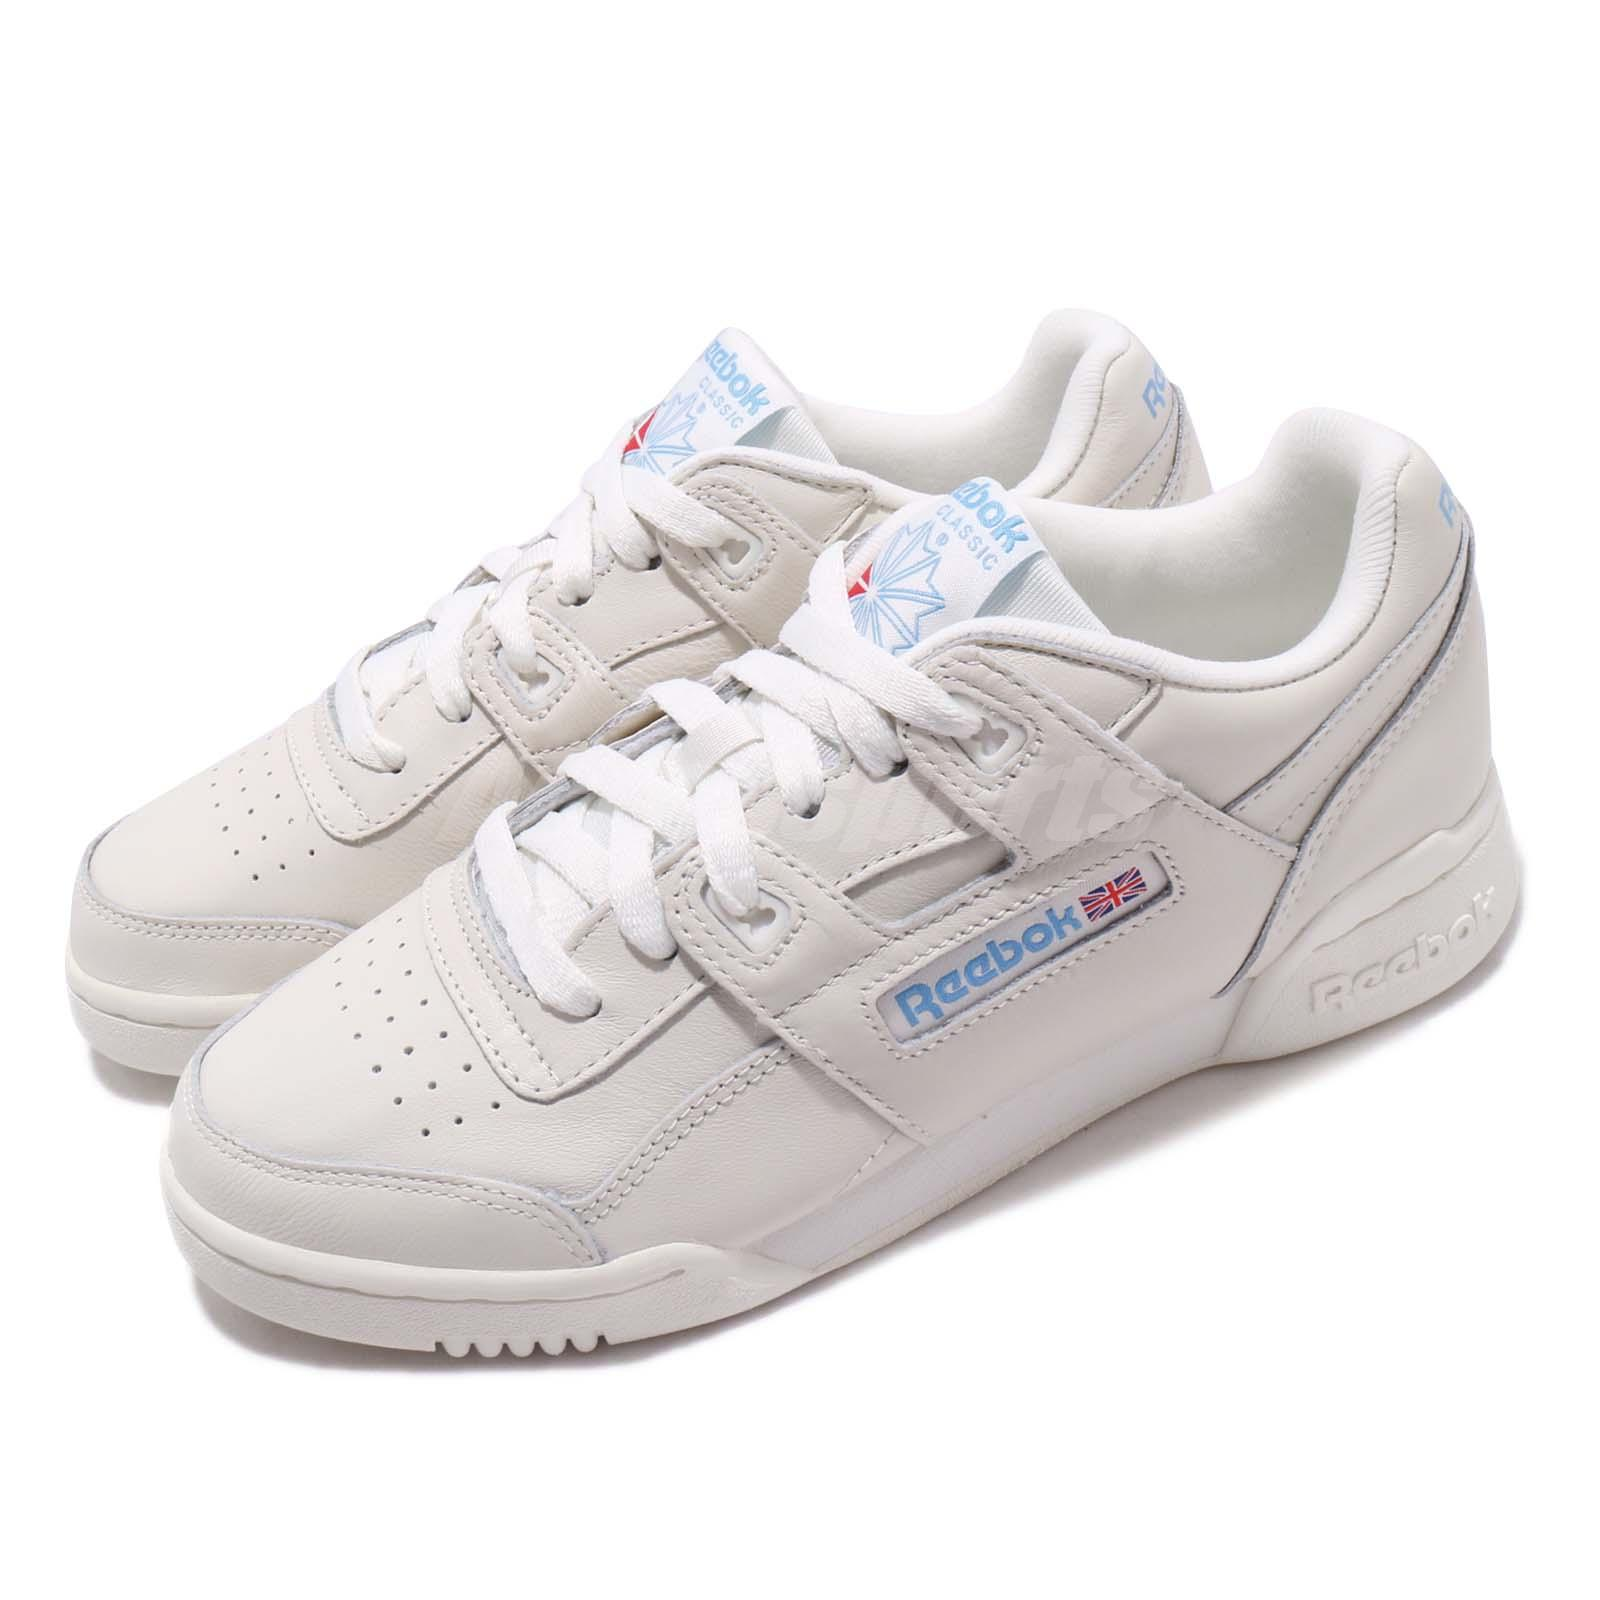 8ff4192ca3d57 Details about Reebok Workout LO Plus Chalk Athletic Blue Women Casual Shoes  Sneakers CN4111